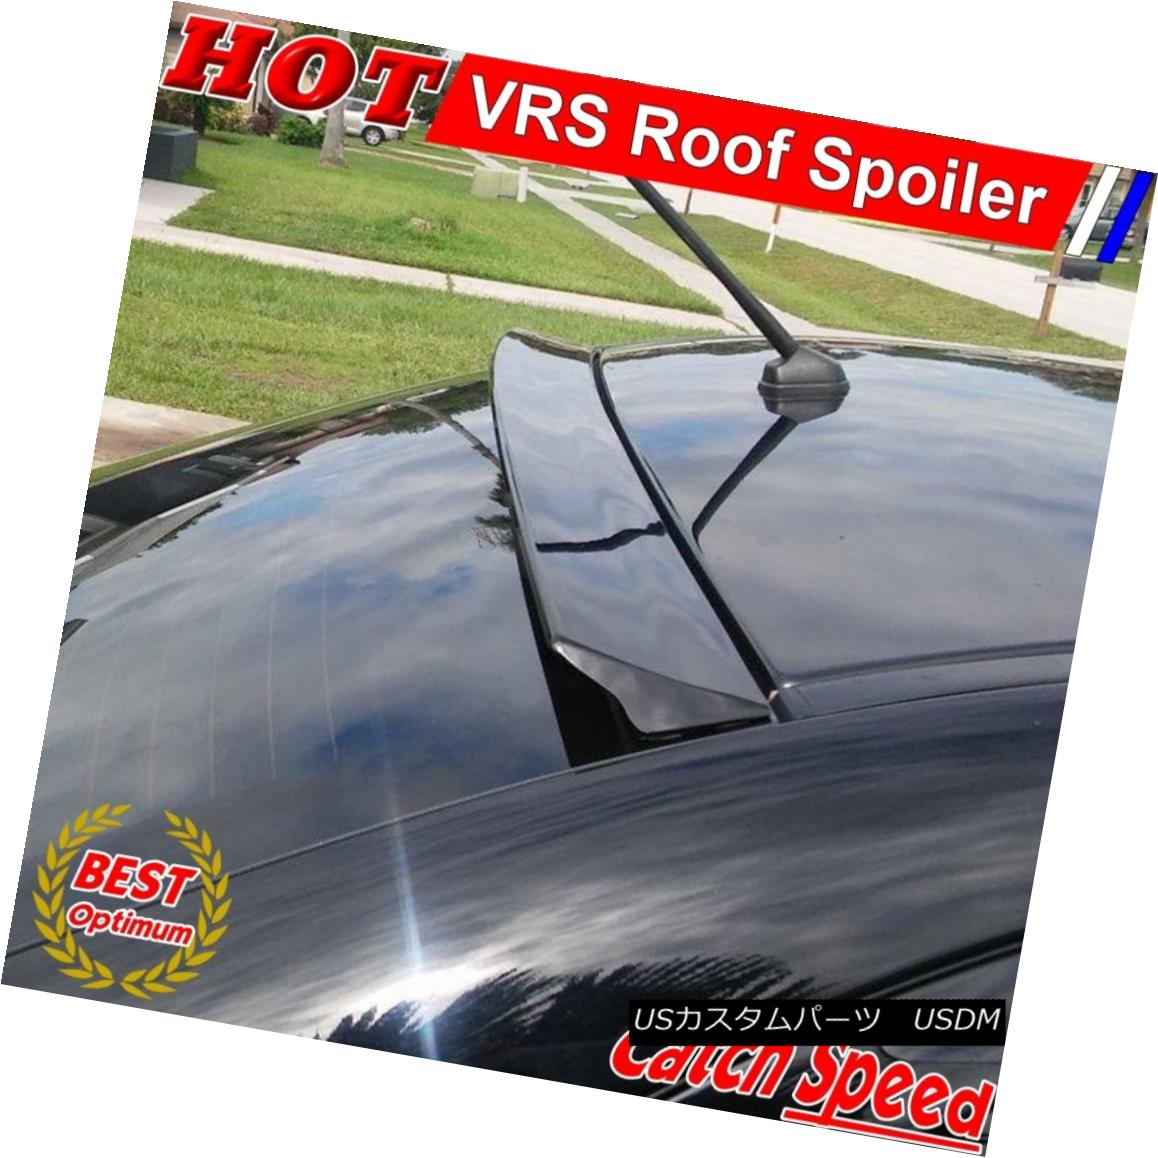 2005-2007 Ford Focus 4 Door Painted Rear Spoiler Wing